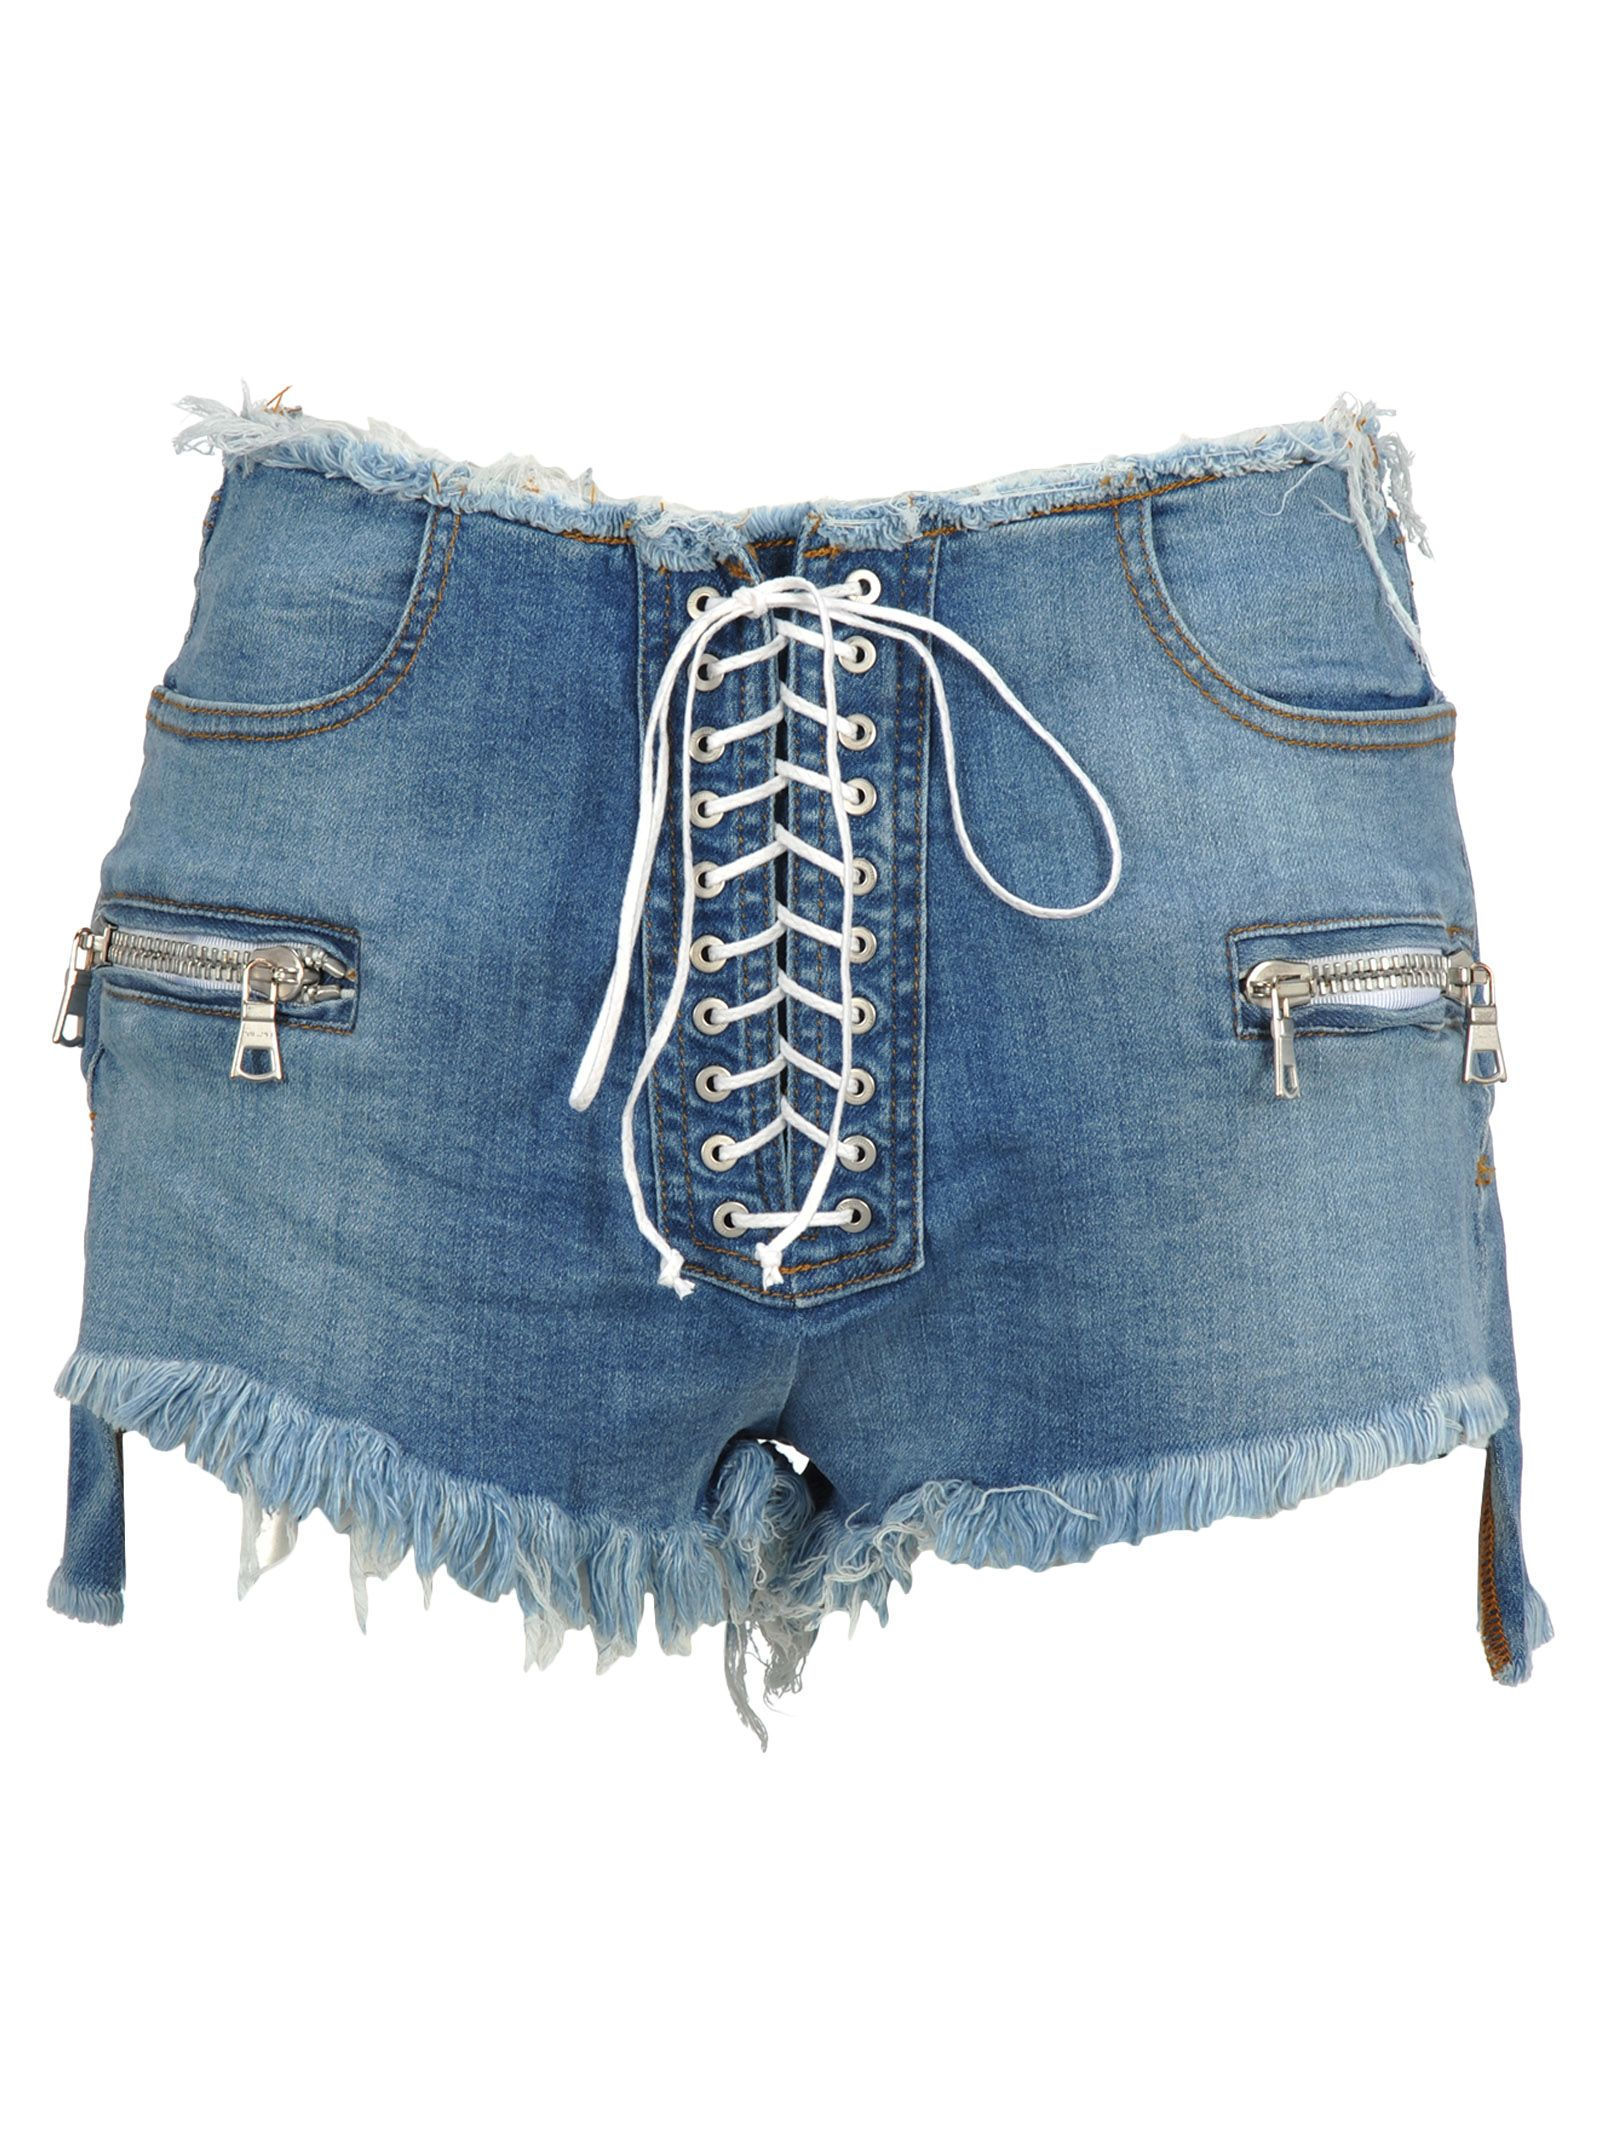 71b884a01f Ben Taverniti Unravel Project Unravel Unravel Project Lace-up Denim Shorts  - LIGHT BLUE ...